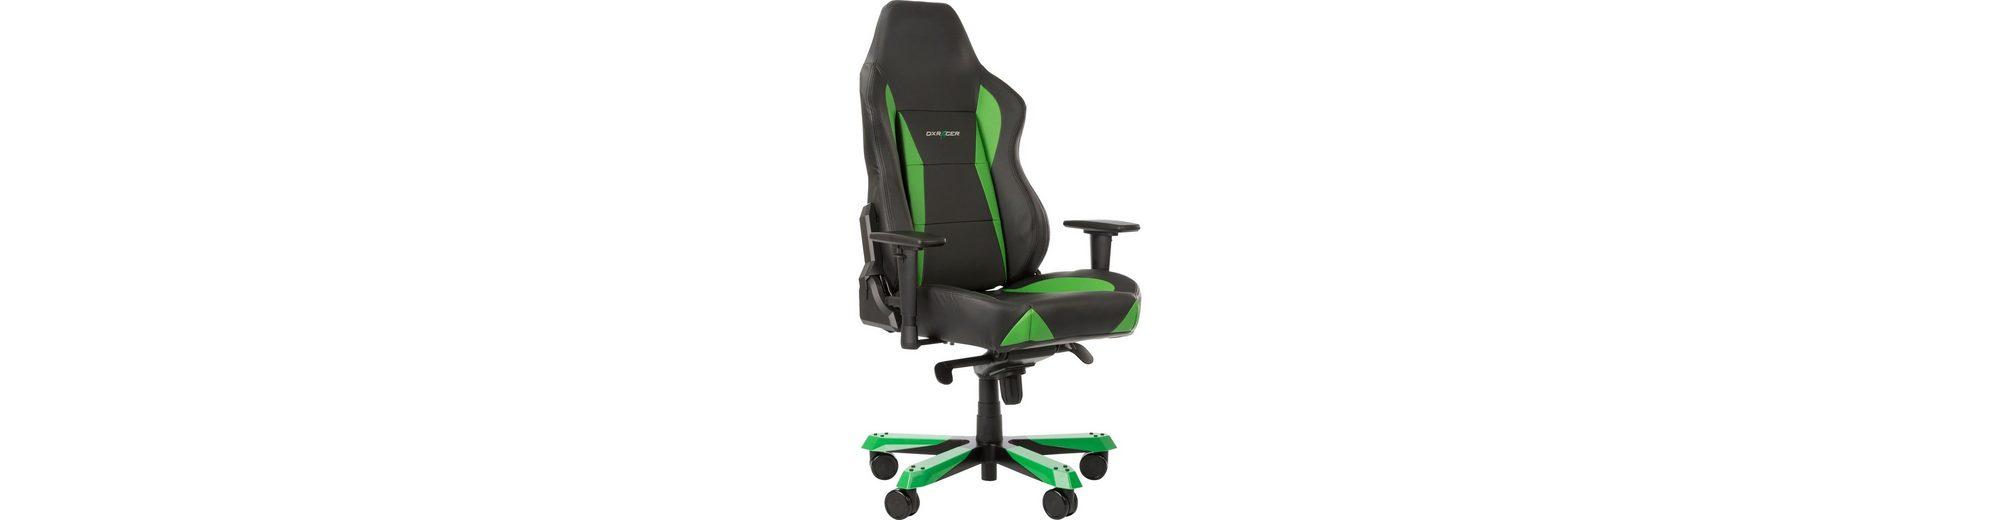 DXRacer Spielsitz »OH/WY0/NE«